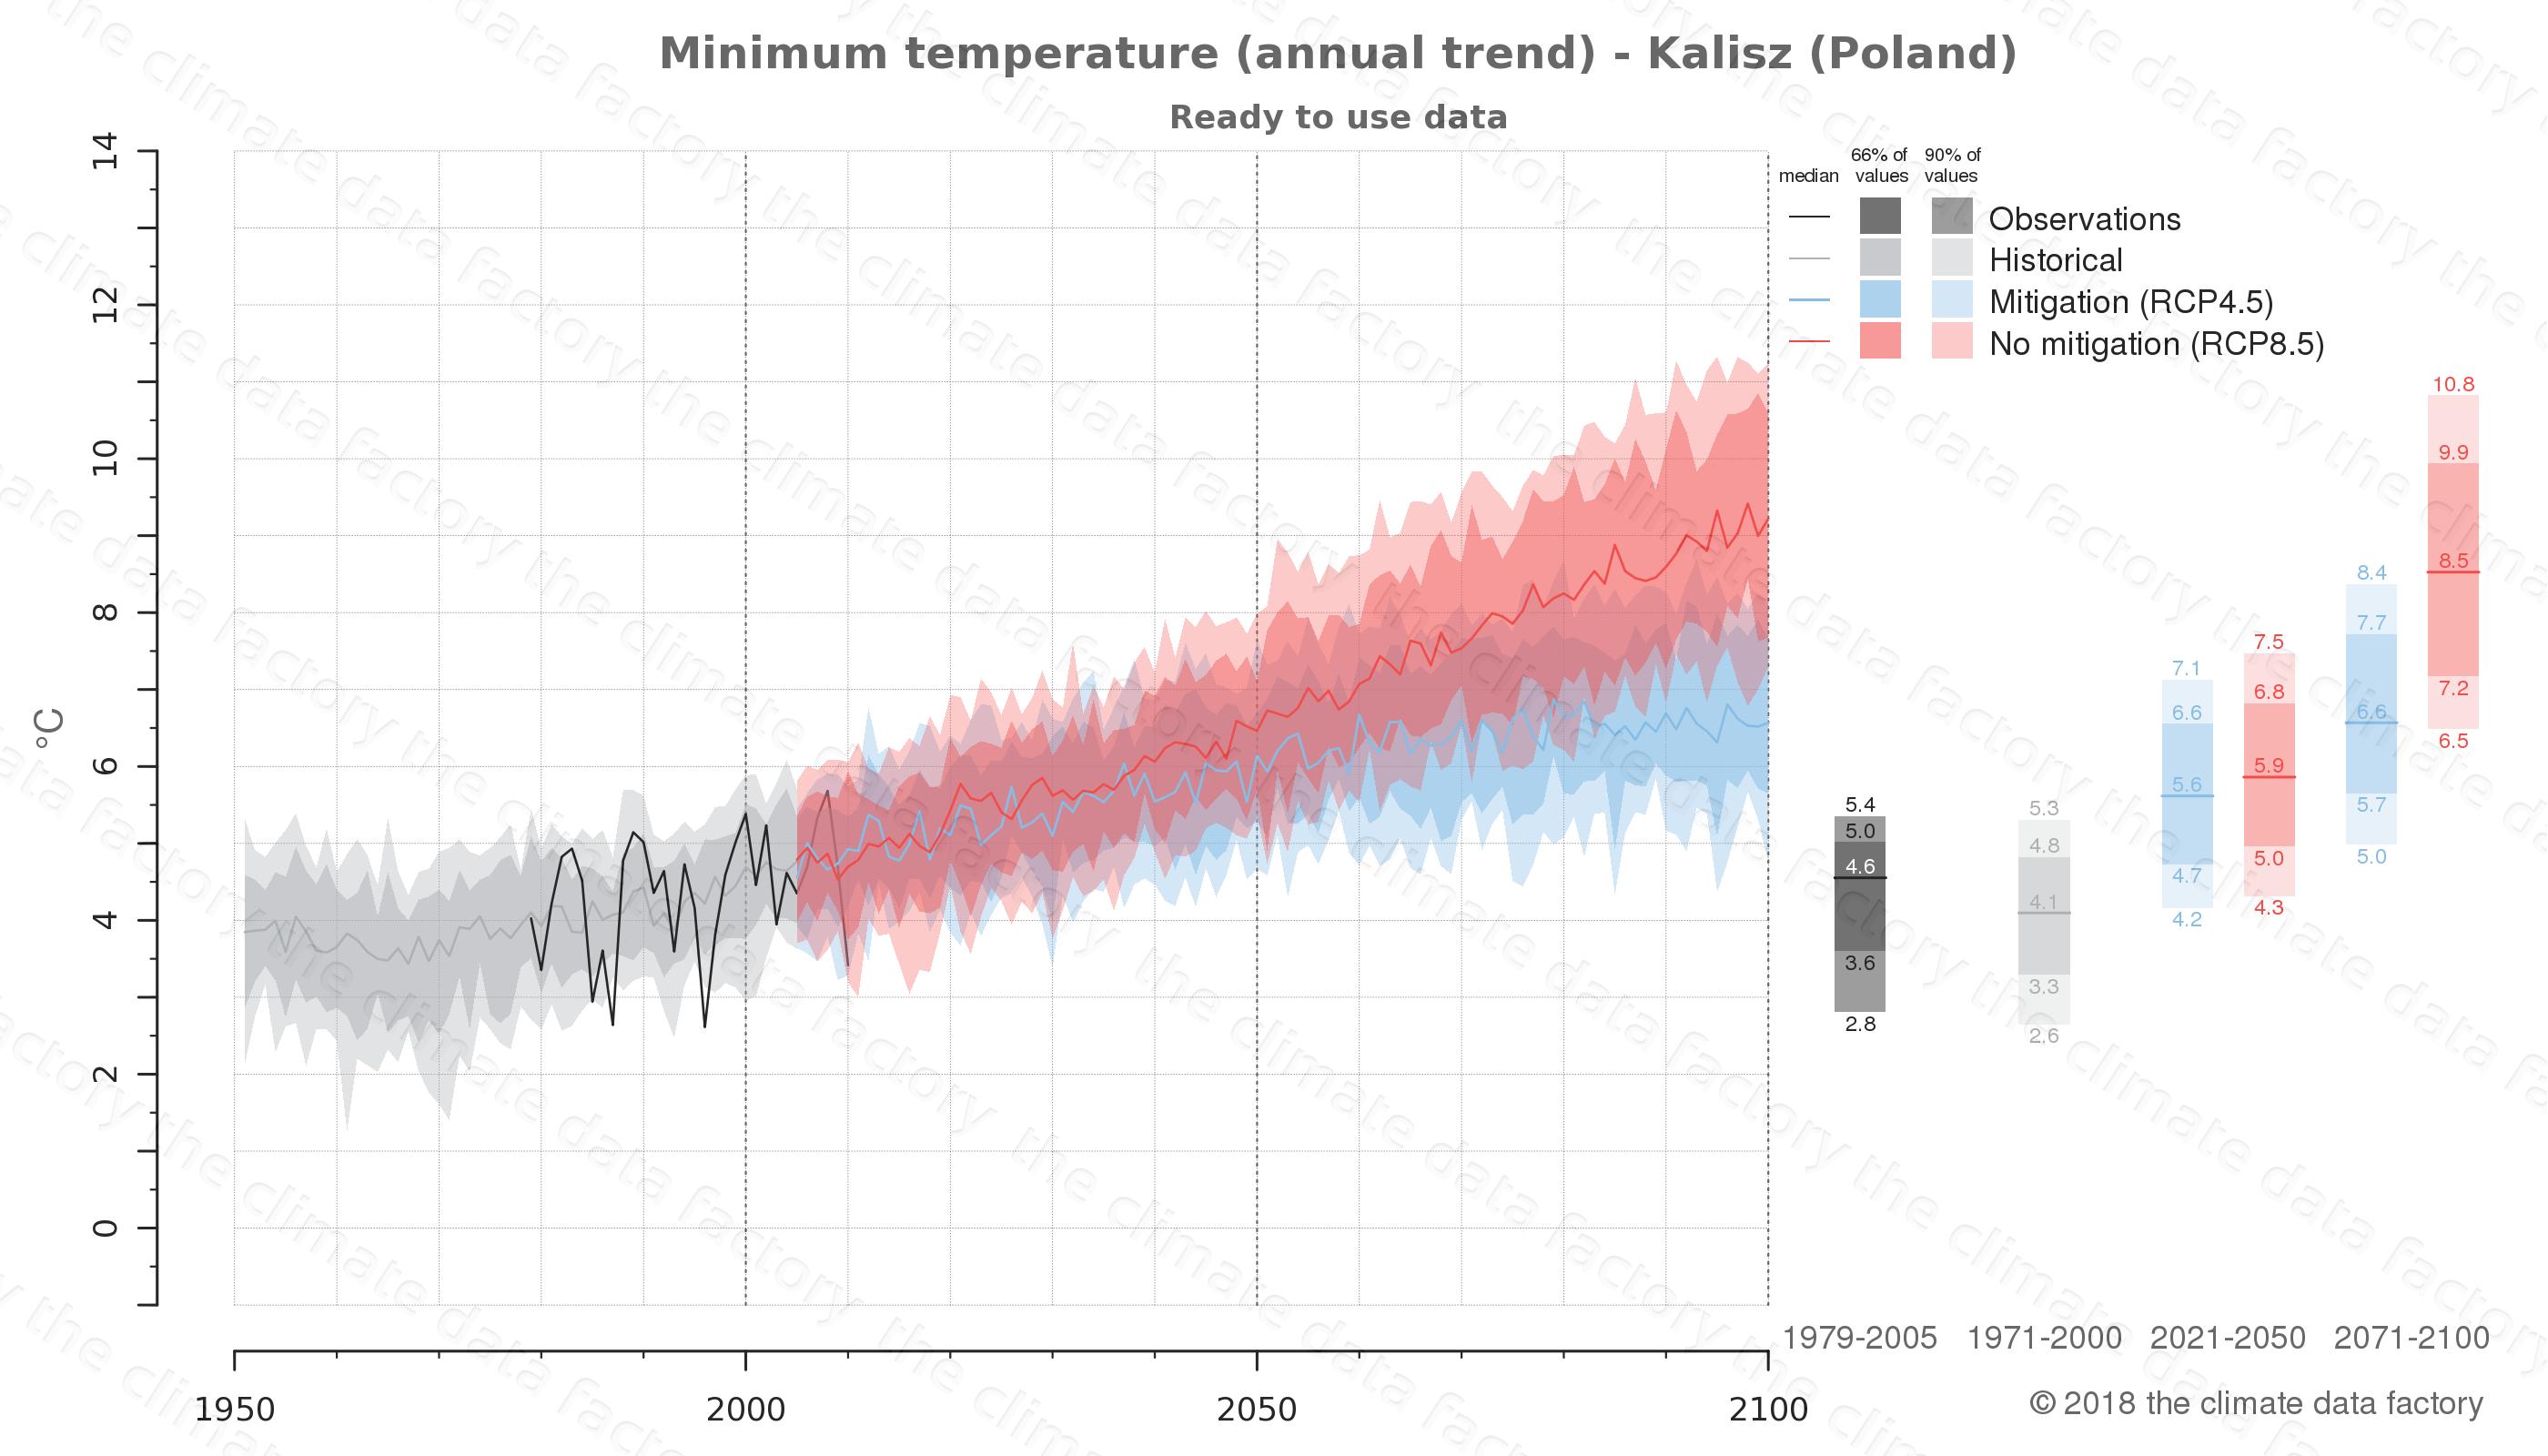 climate change data policy adaptation climate graph city data minimum-temperature kalisz poland